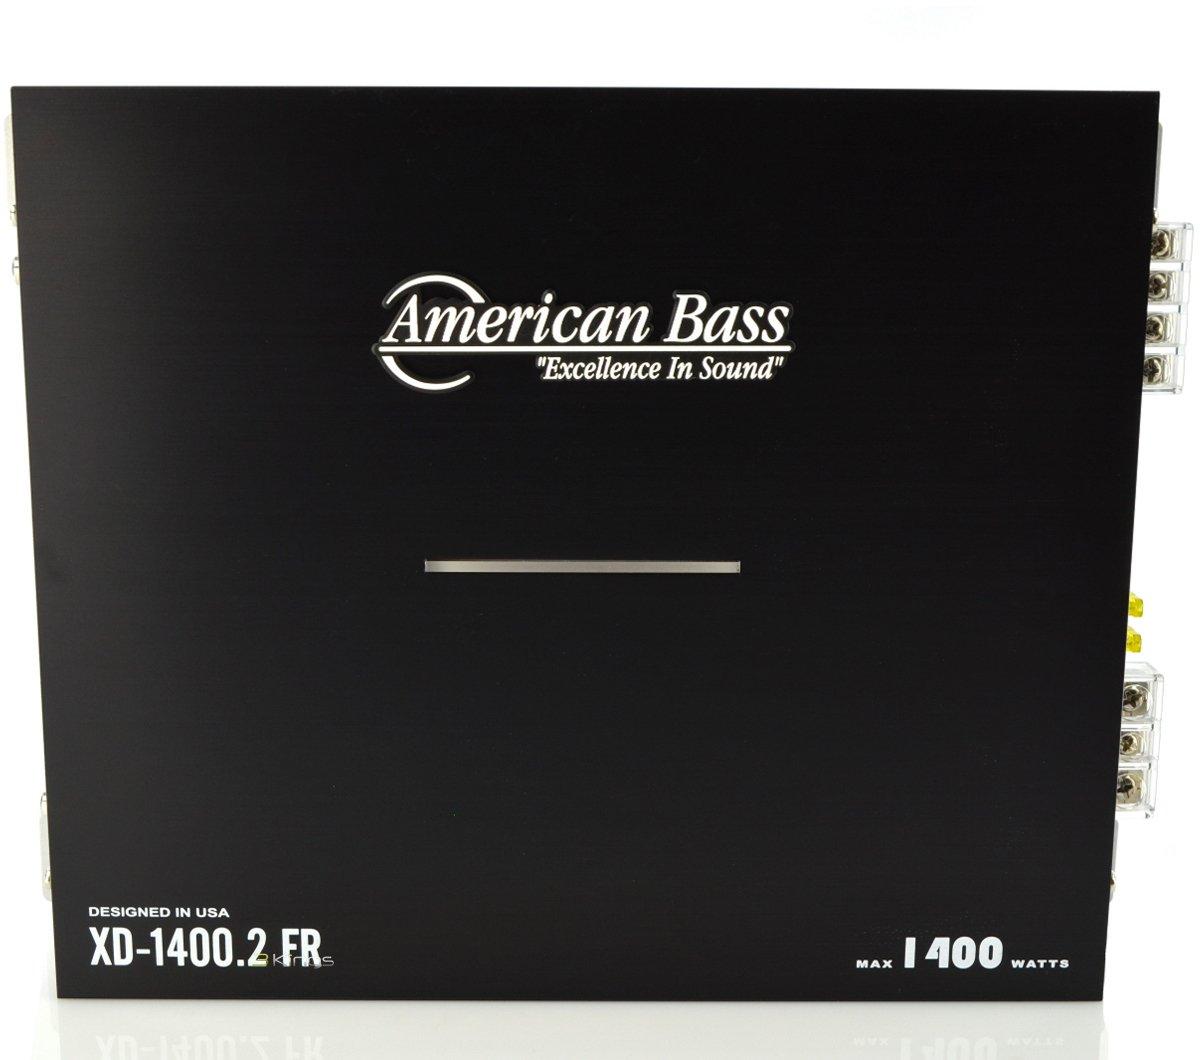 New American Bass Xd14002 1500 Watt 2 Channel Car Amp Car Audio Amplifier